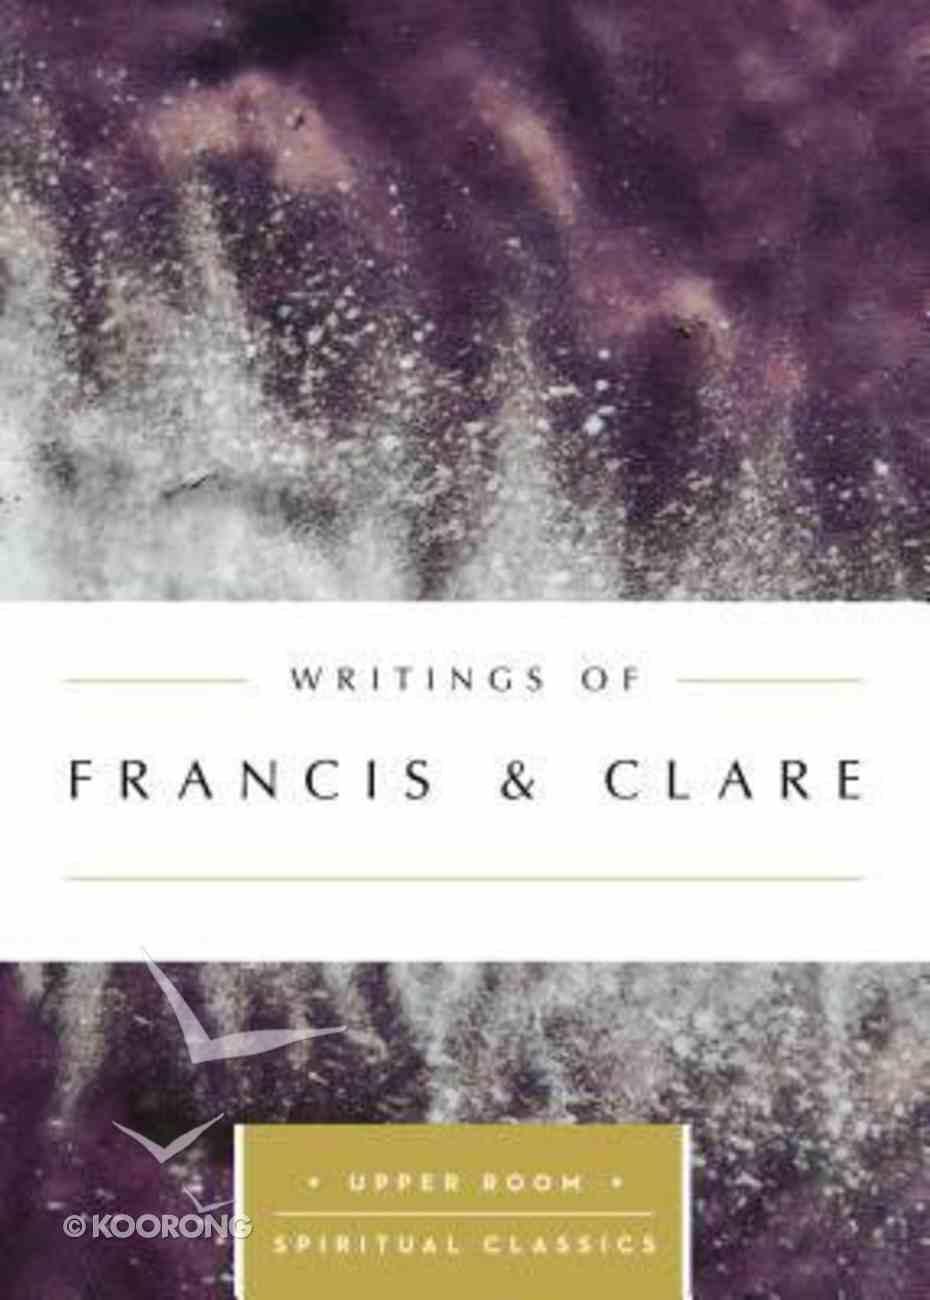 Writings of Francis & Clare (Upper Room Spiritual Classics Series) Paperback